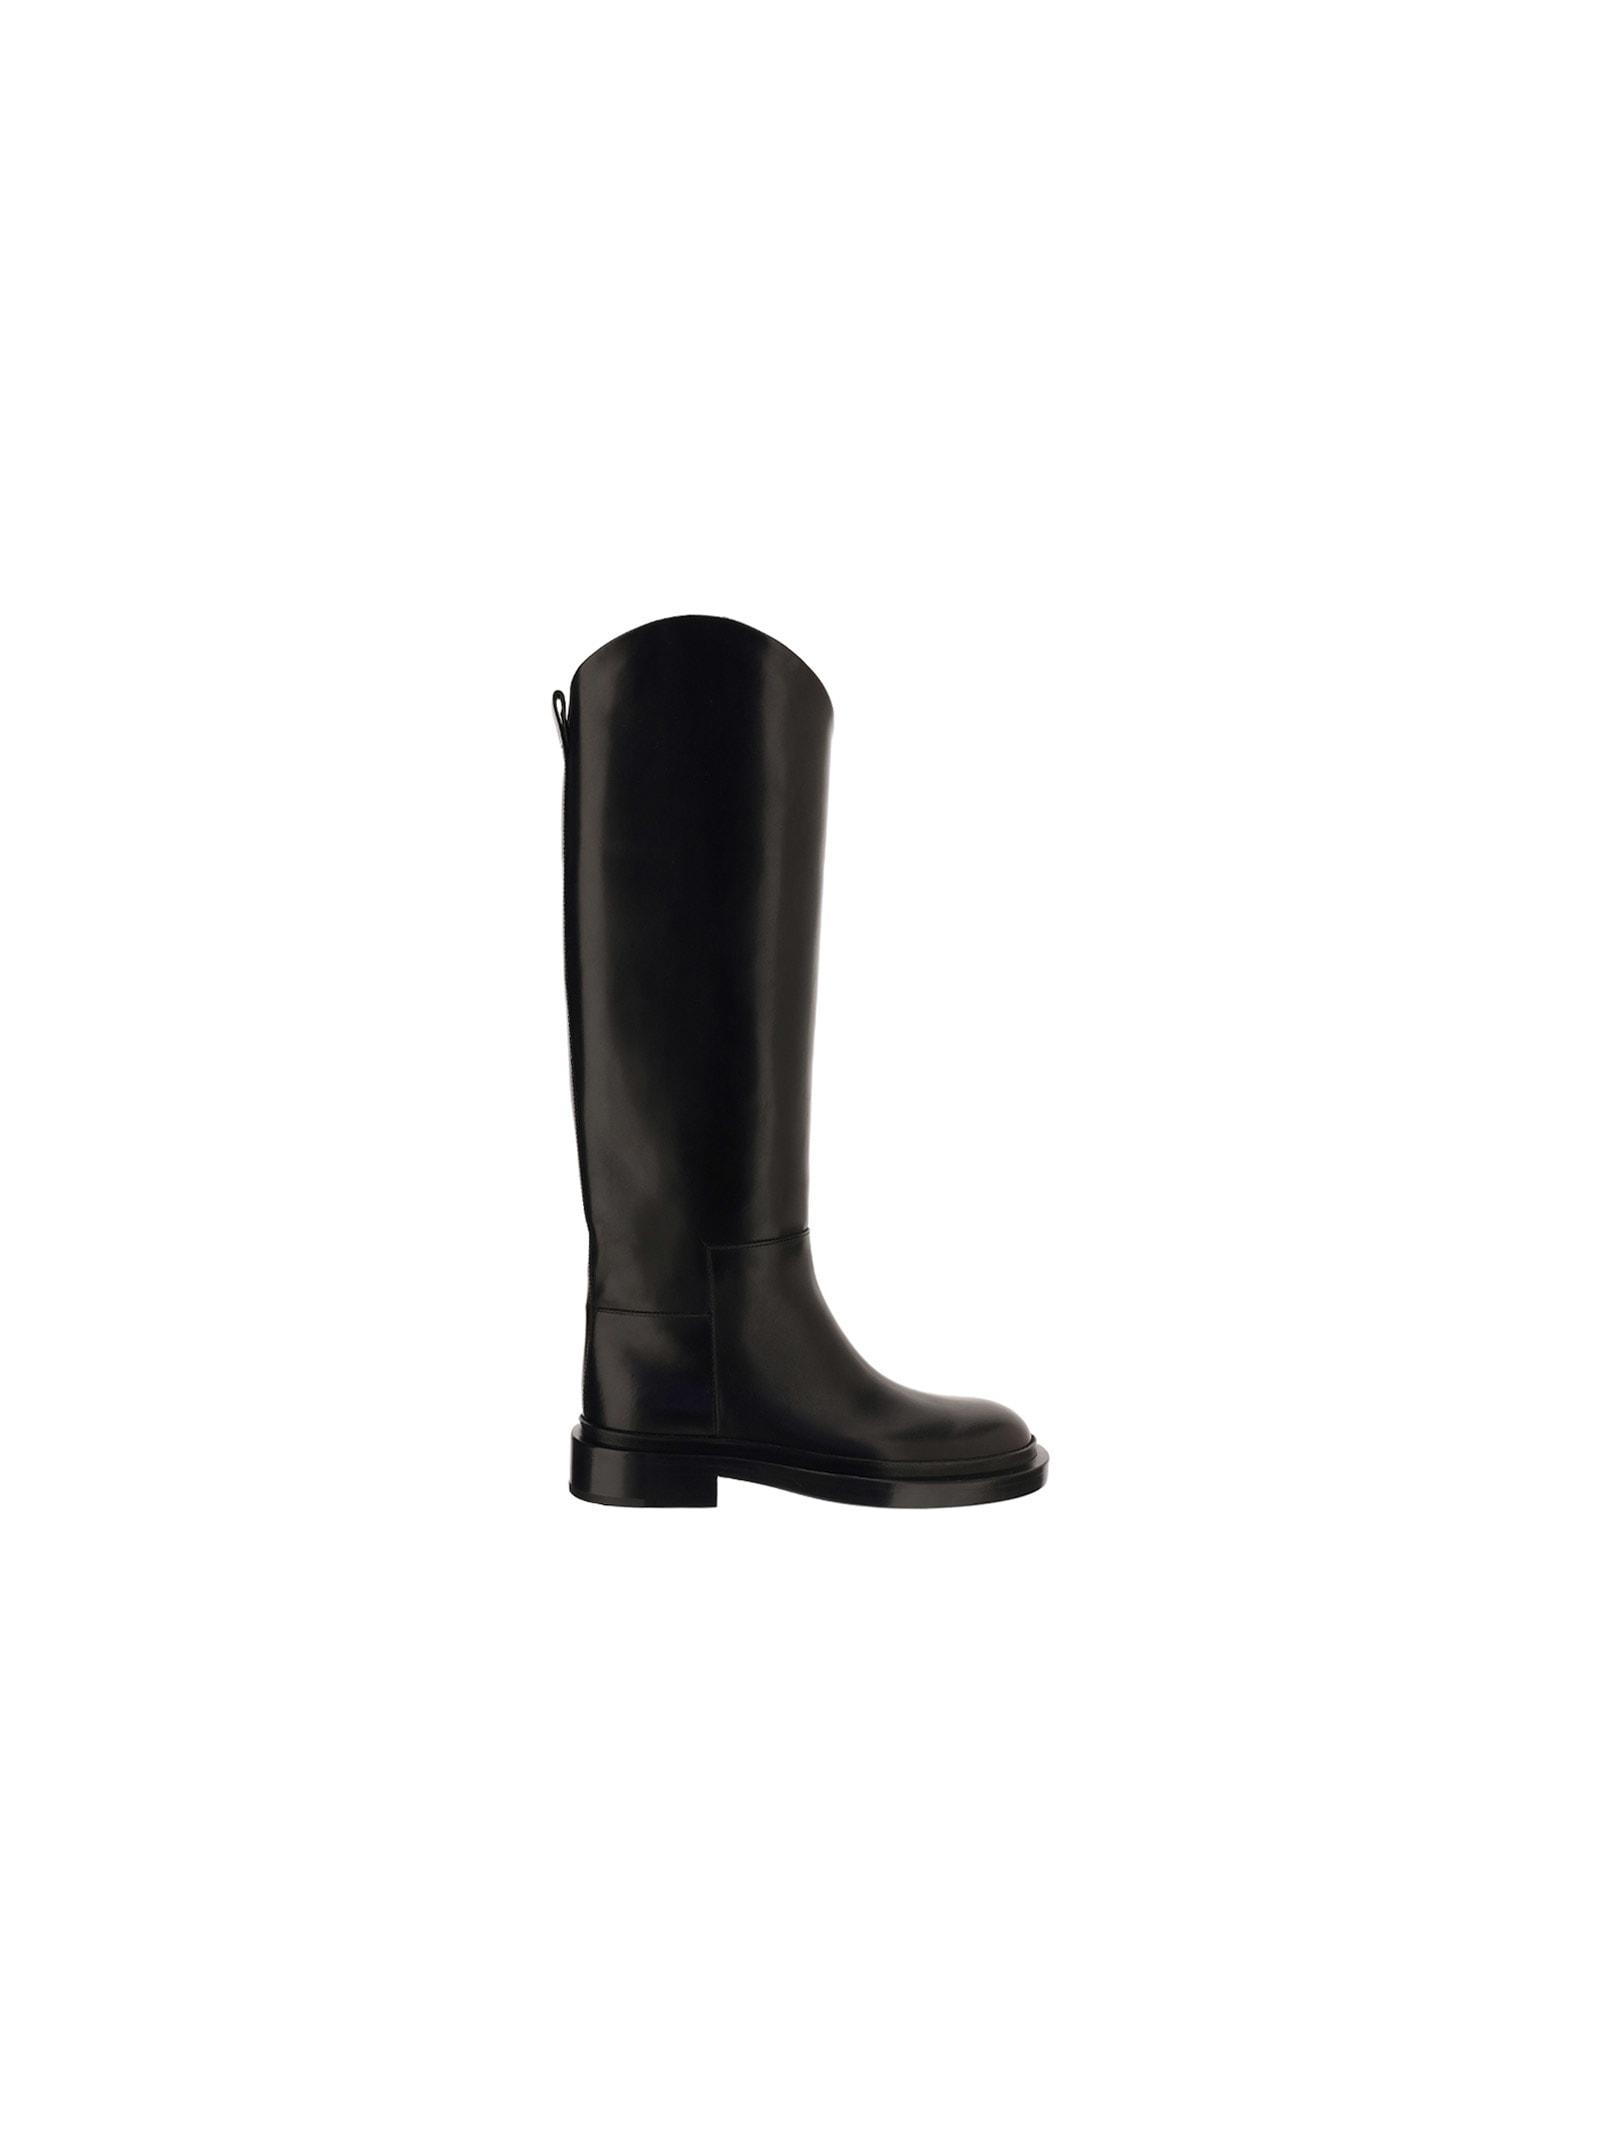 Buy Jil Sander Boots online, shop Jil Sander shoes with free shipping